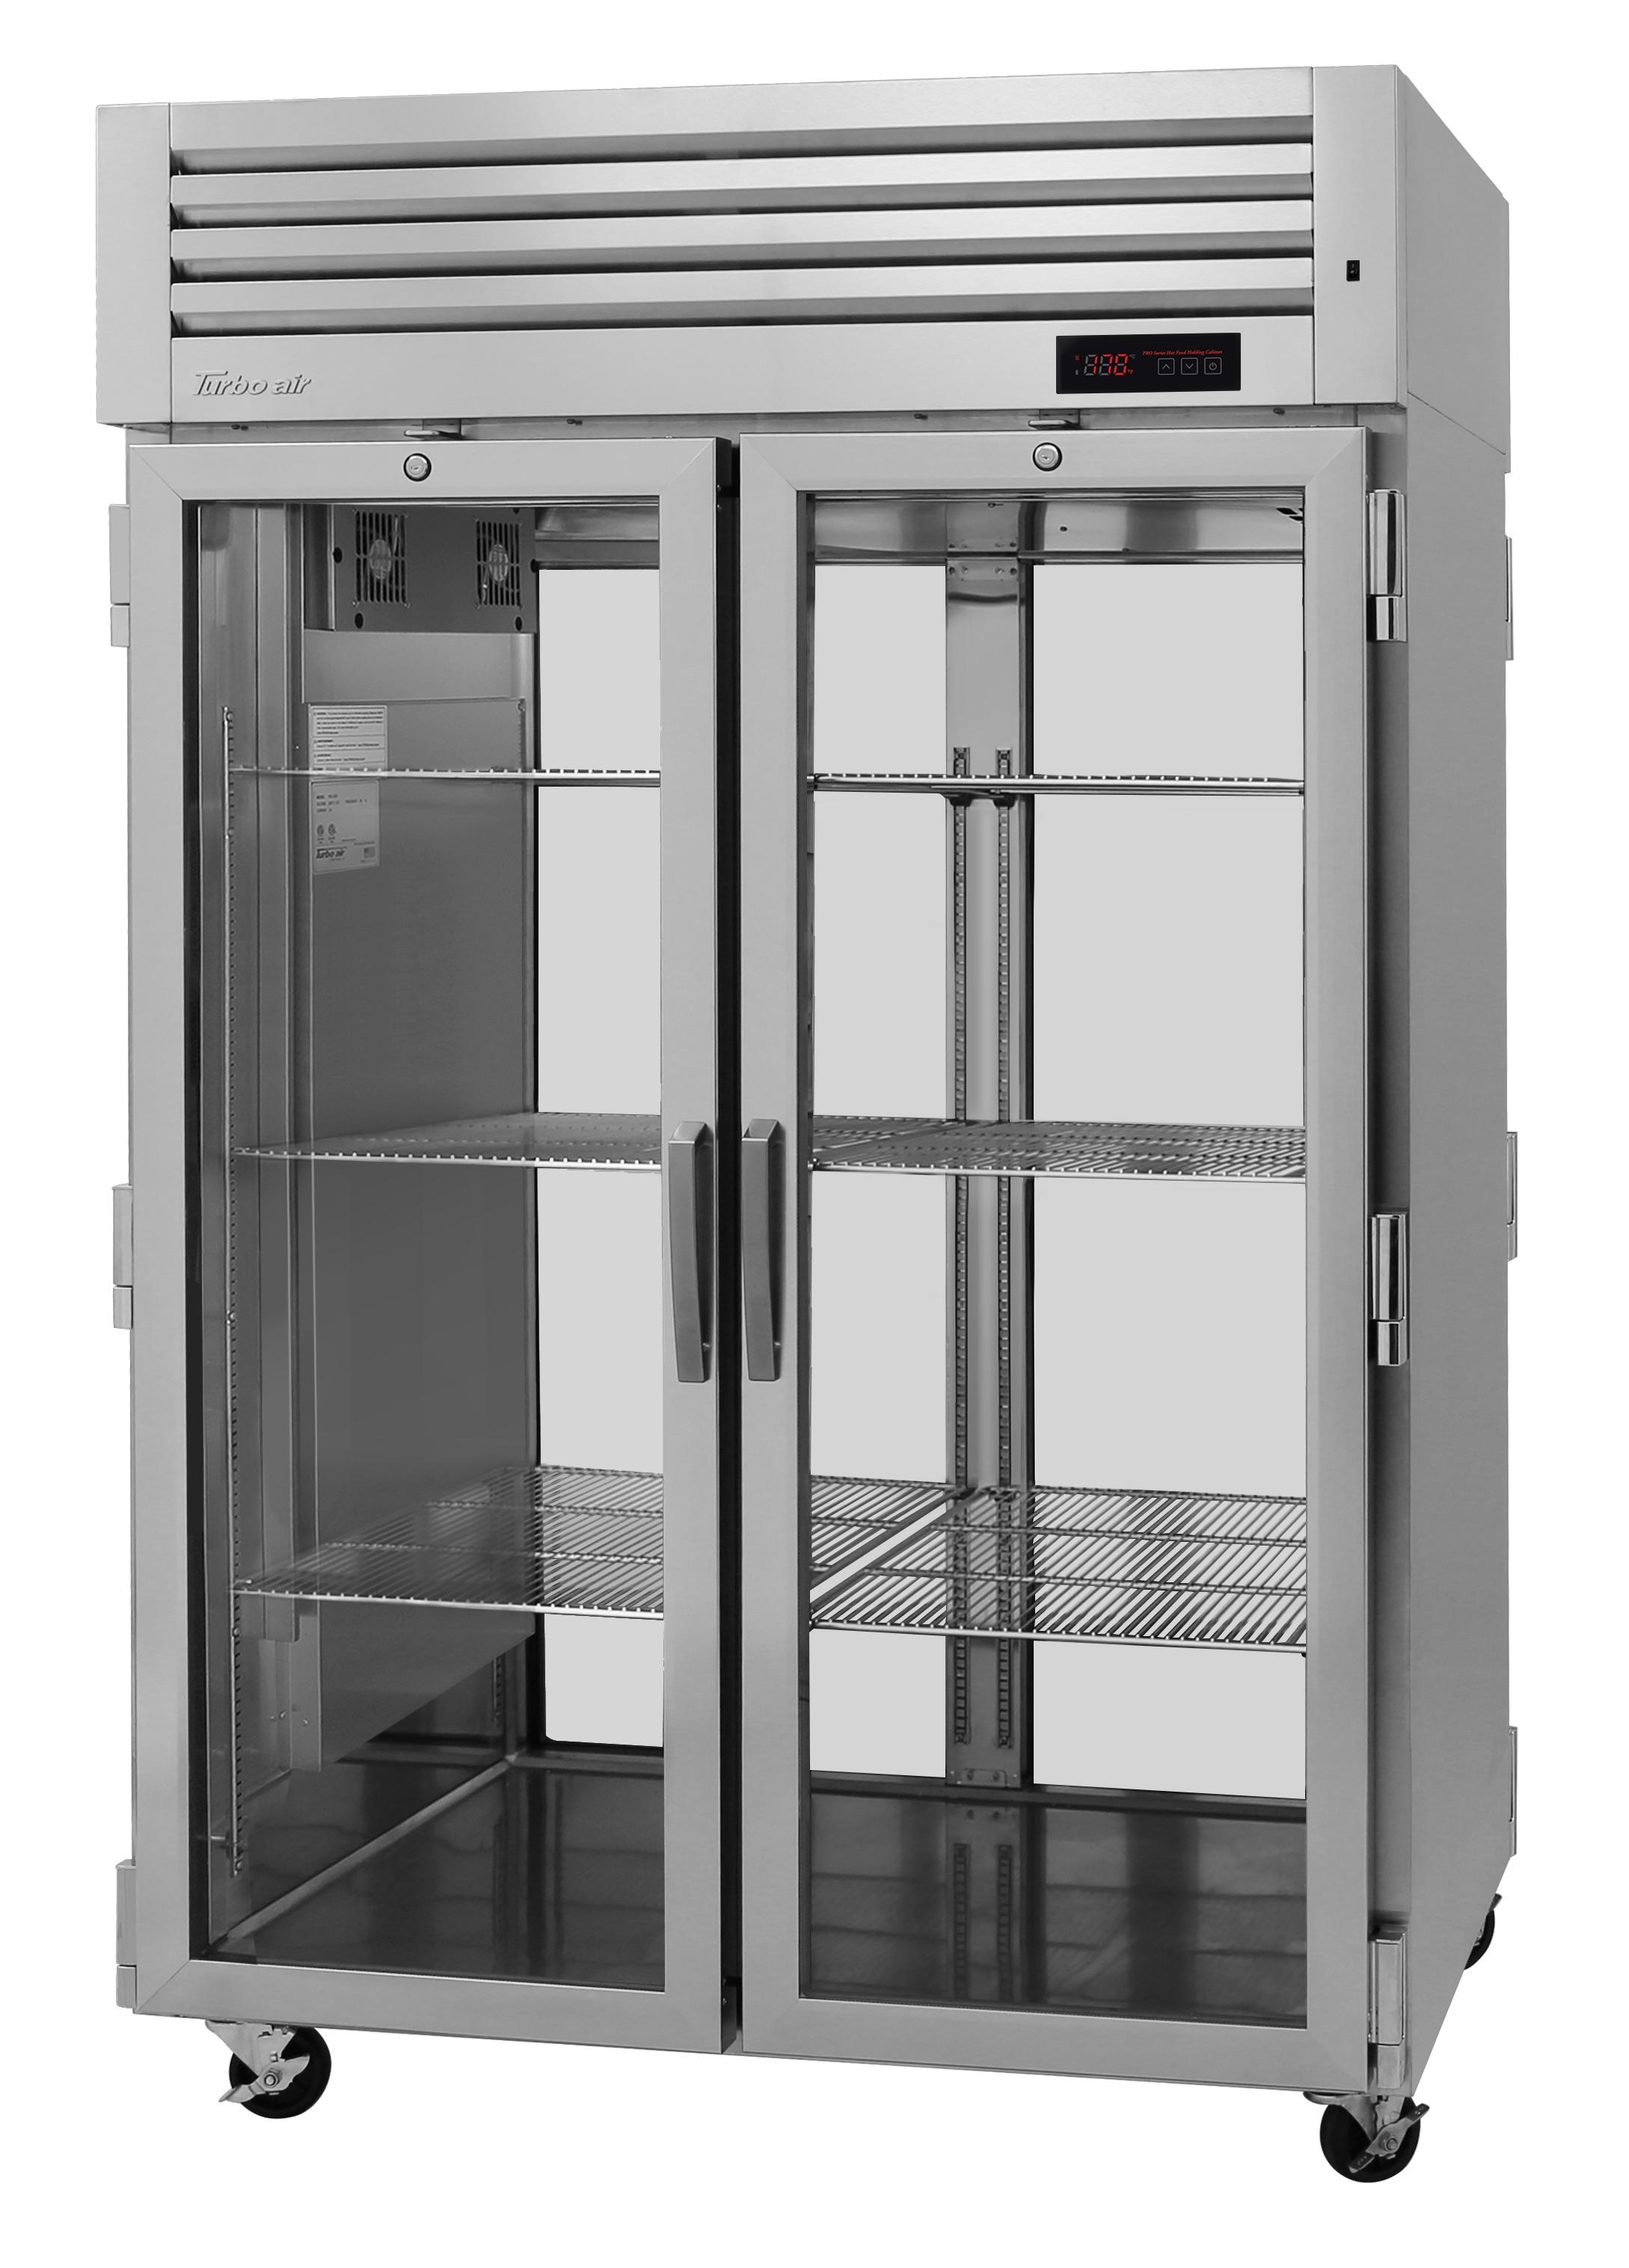 Turbo Air PRO-50H-G-PT pro series - reach in refrigerator